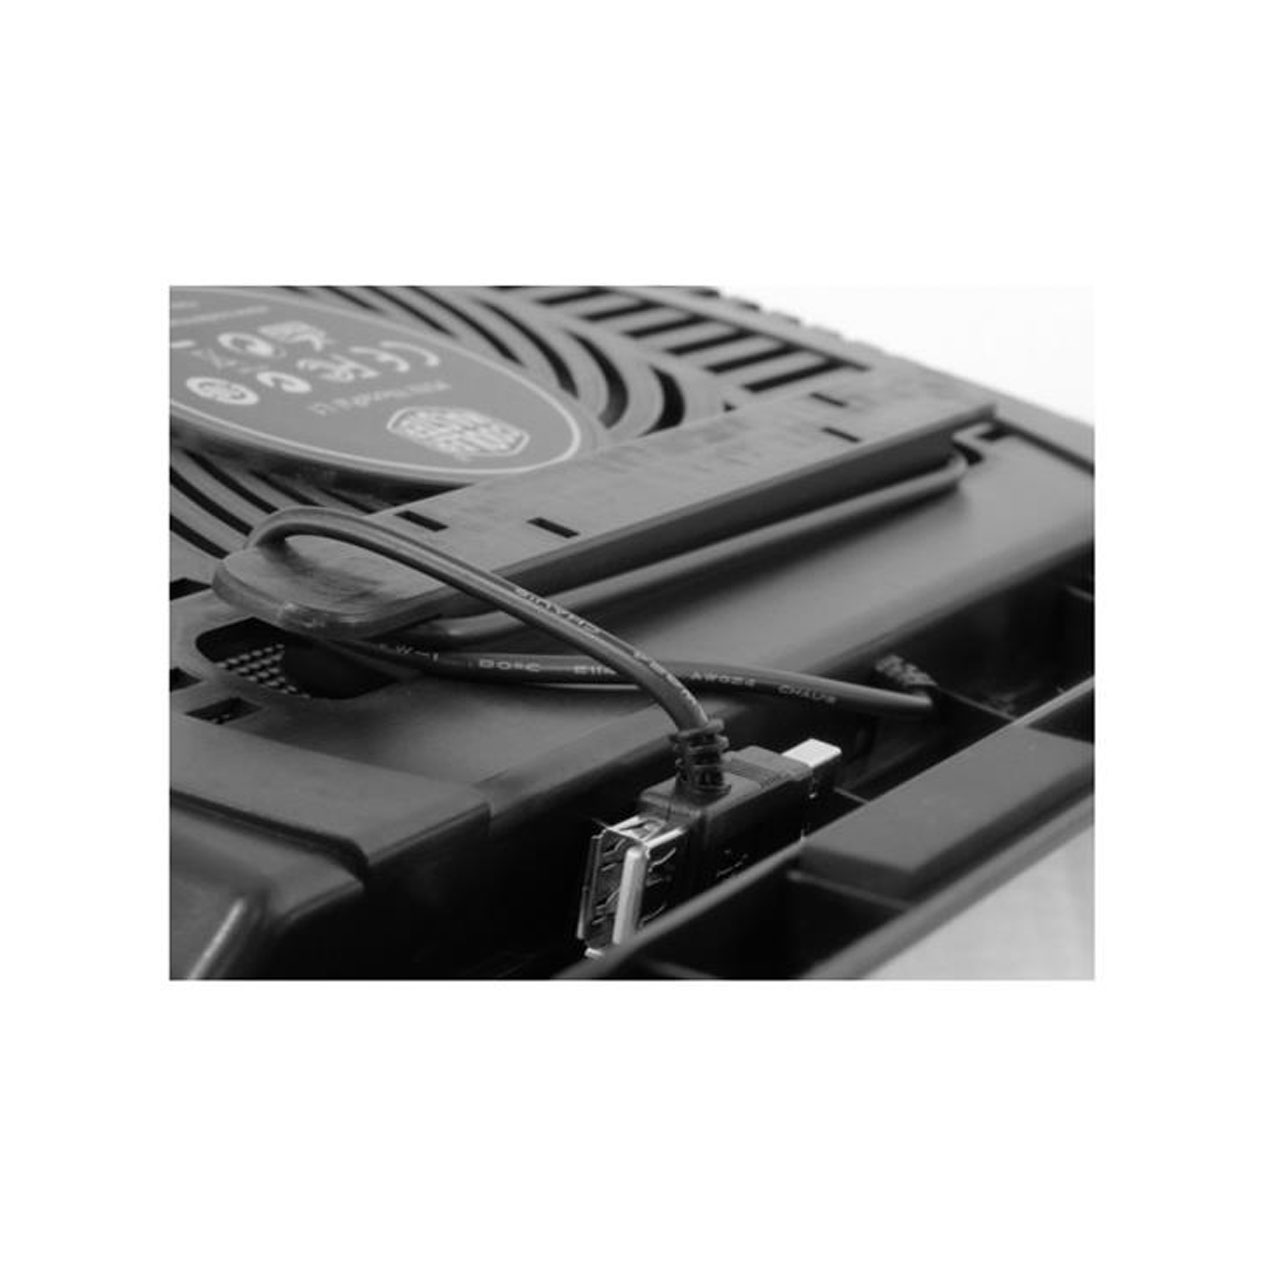 پایه-خنک-کننده-نوت-بوک-3کولر-مستر-مدل-NOTEPAL-L1